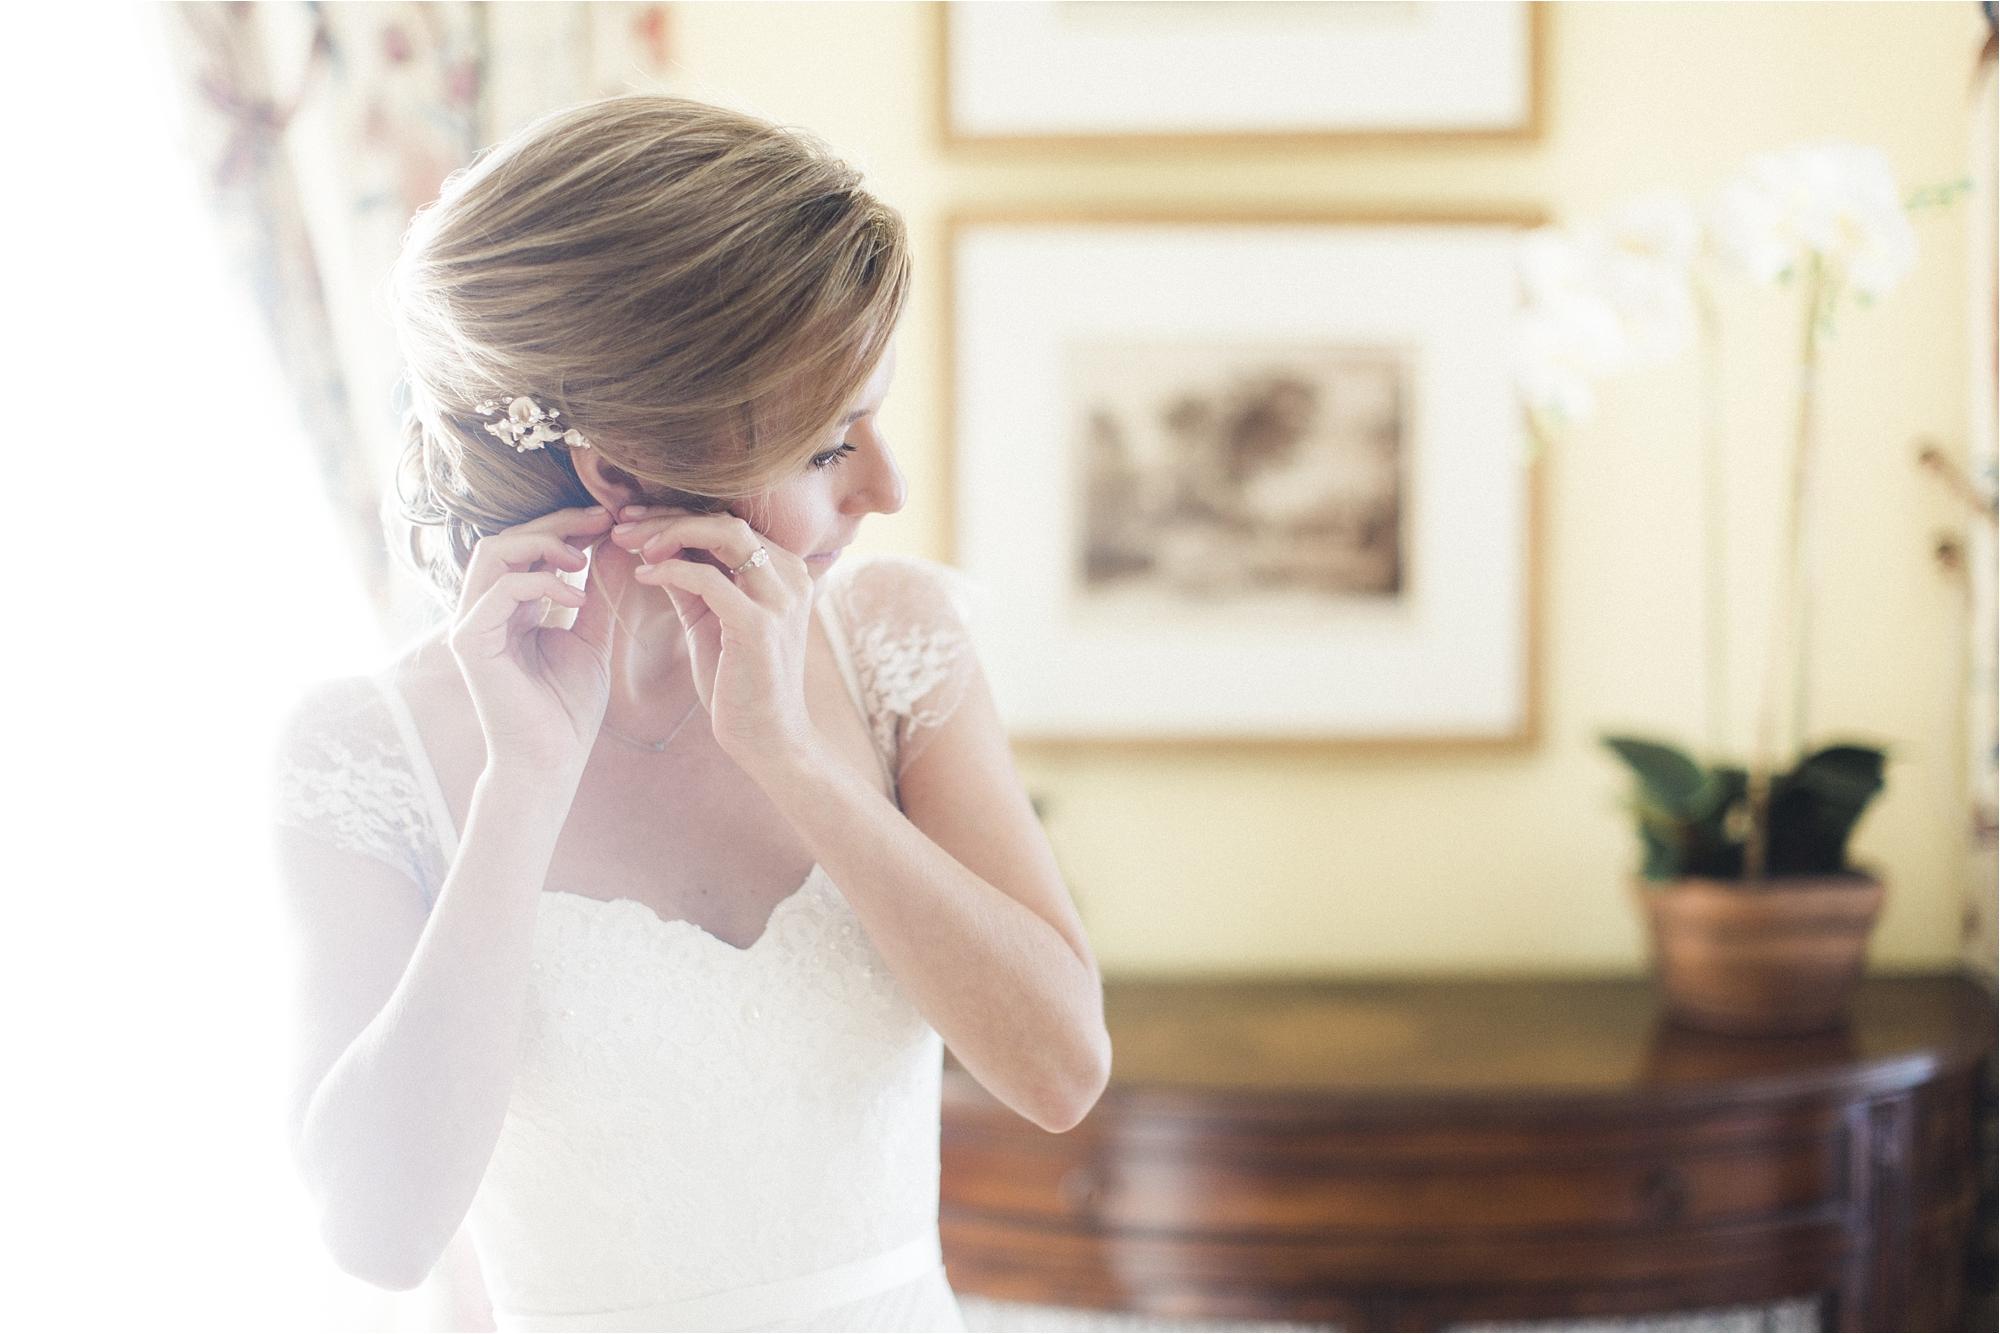 stephanie-yonce-photography-elegant-private-club-washington-dc-wedding-photos_0001.jpg